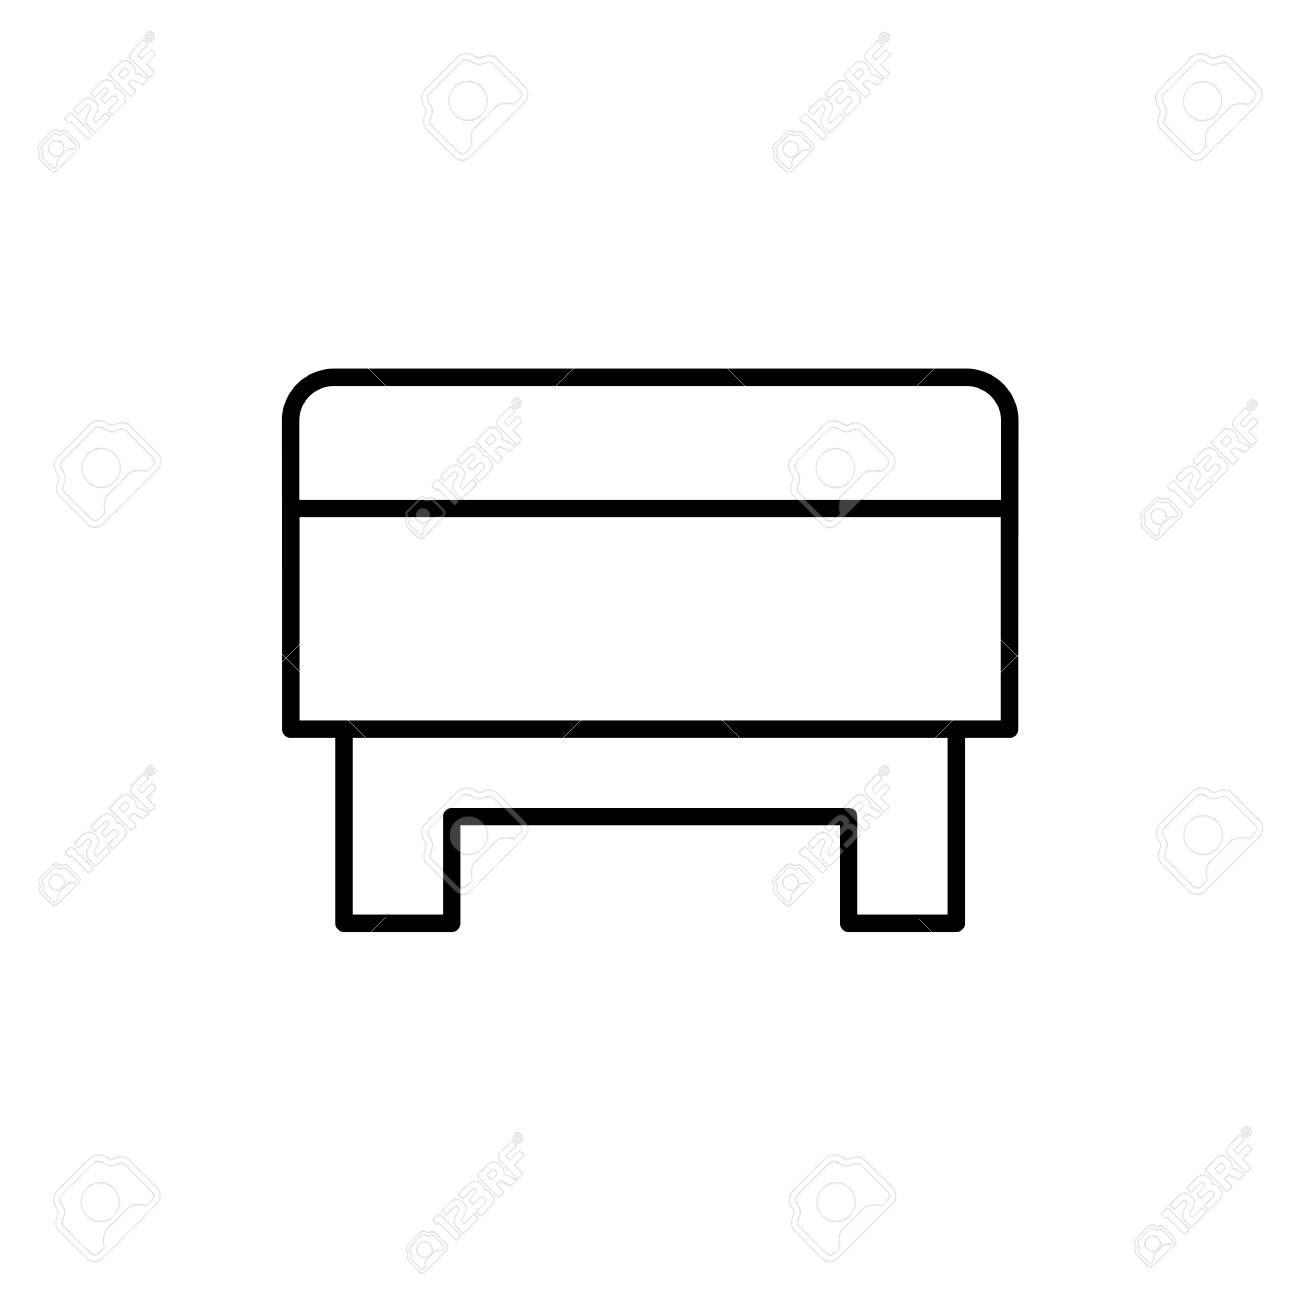 Superb Black White Vector Illustration Of Square Storage Ottoman Unemploymentrelief Wooden Chair Designs For Living Room Unemploymentrelieforg